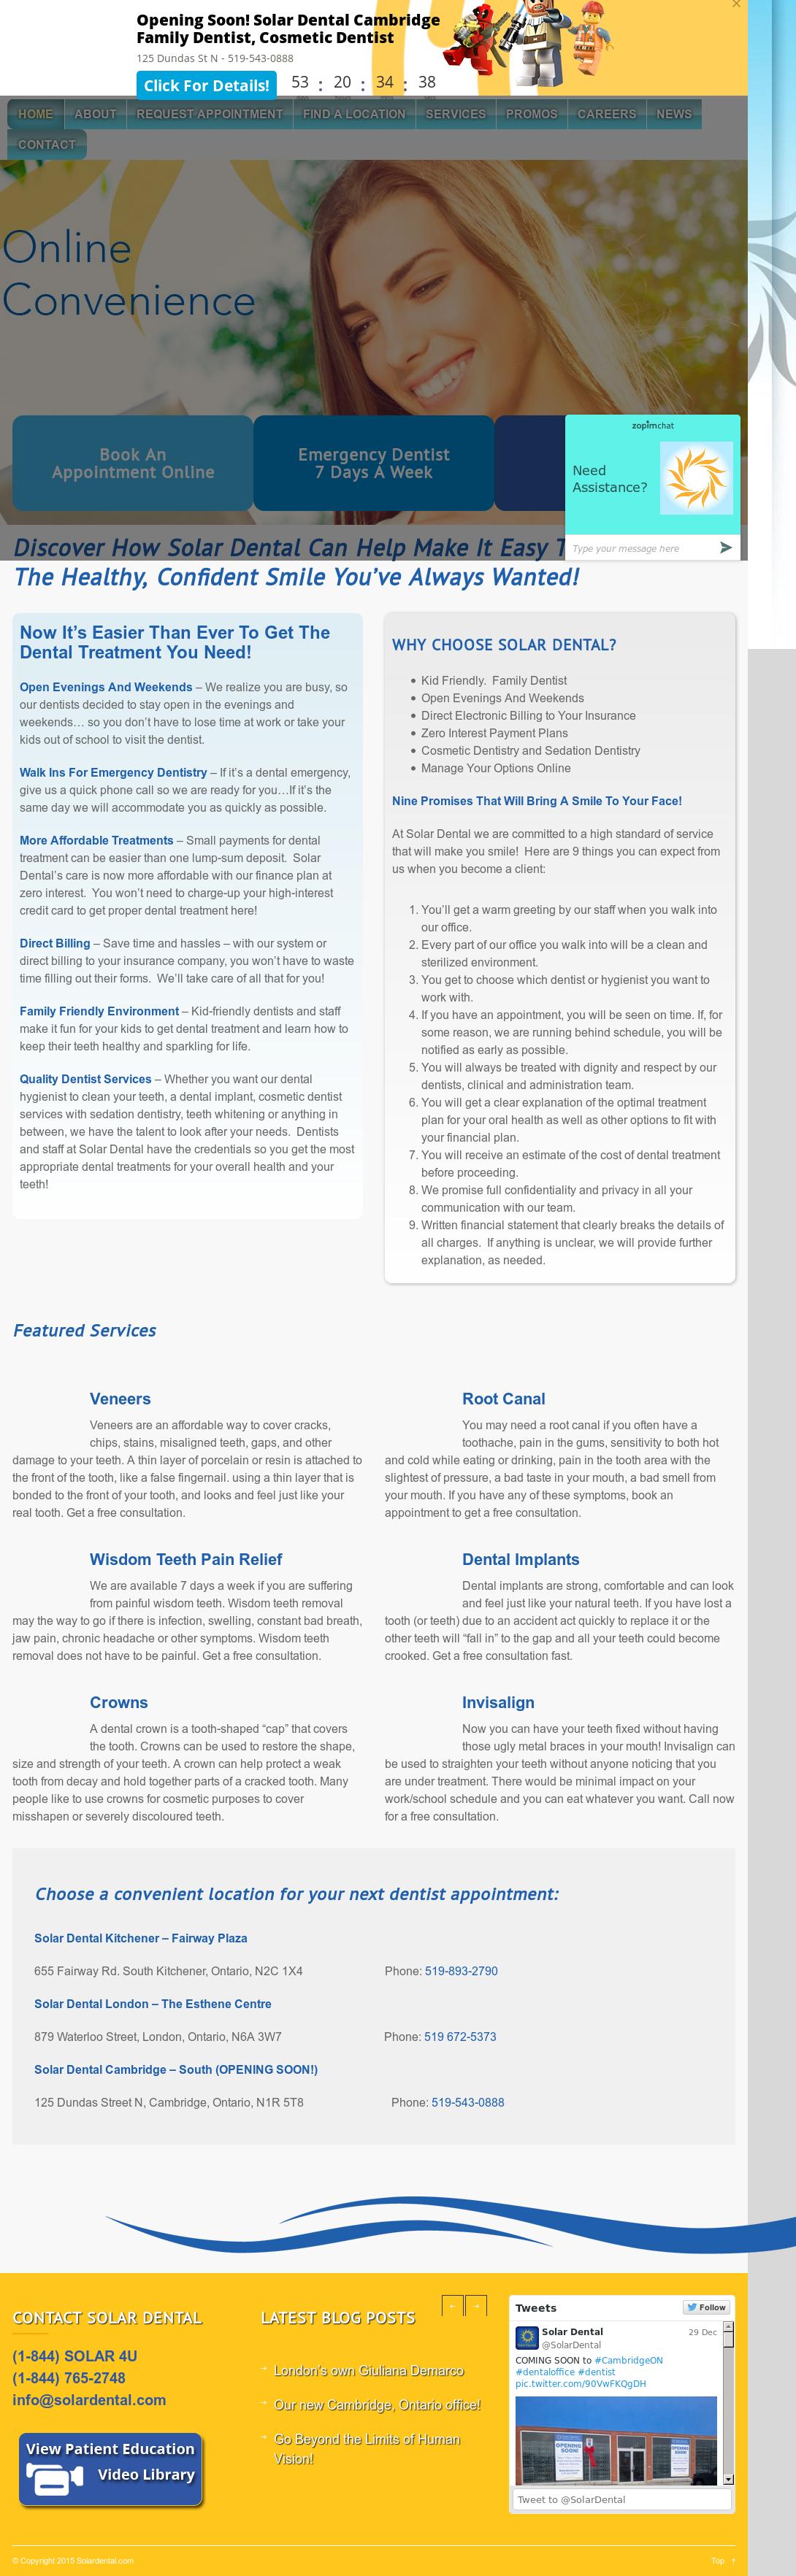 Solardental Competitors, Revenue and Employees - Owler Company Profile